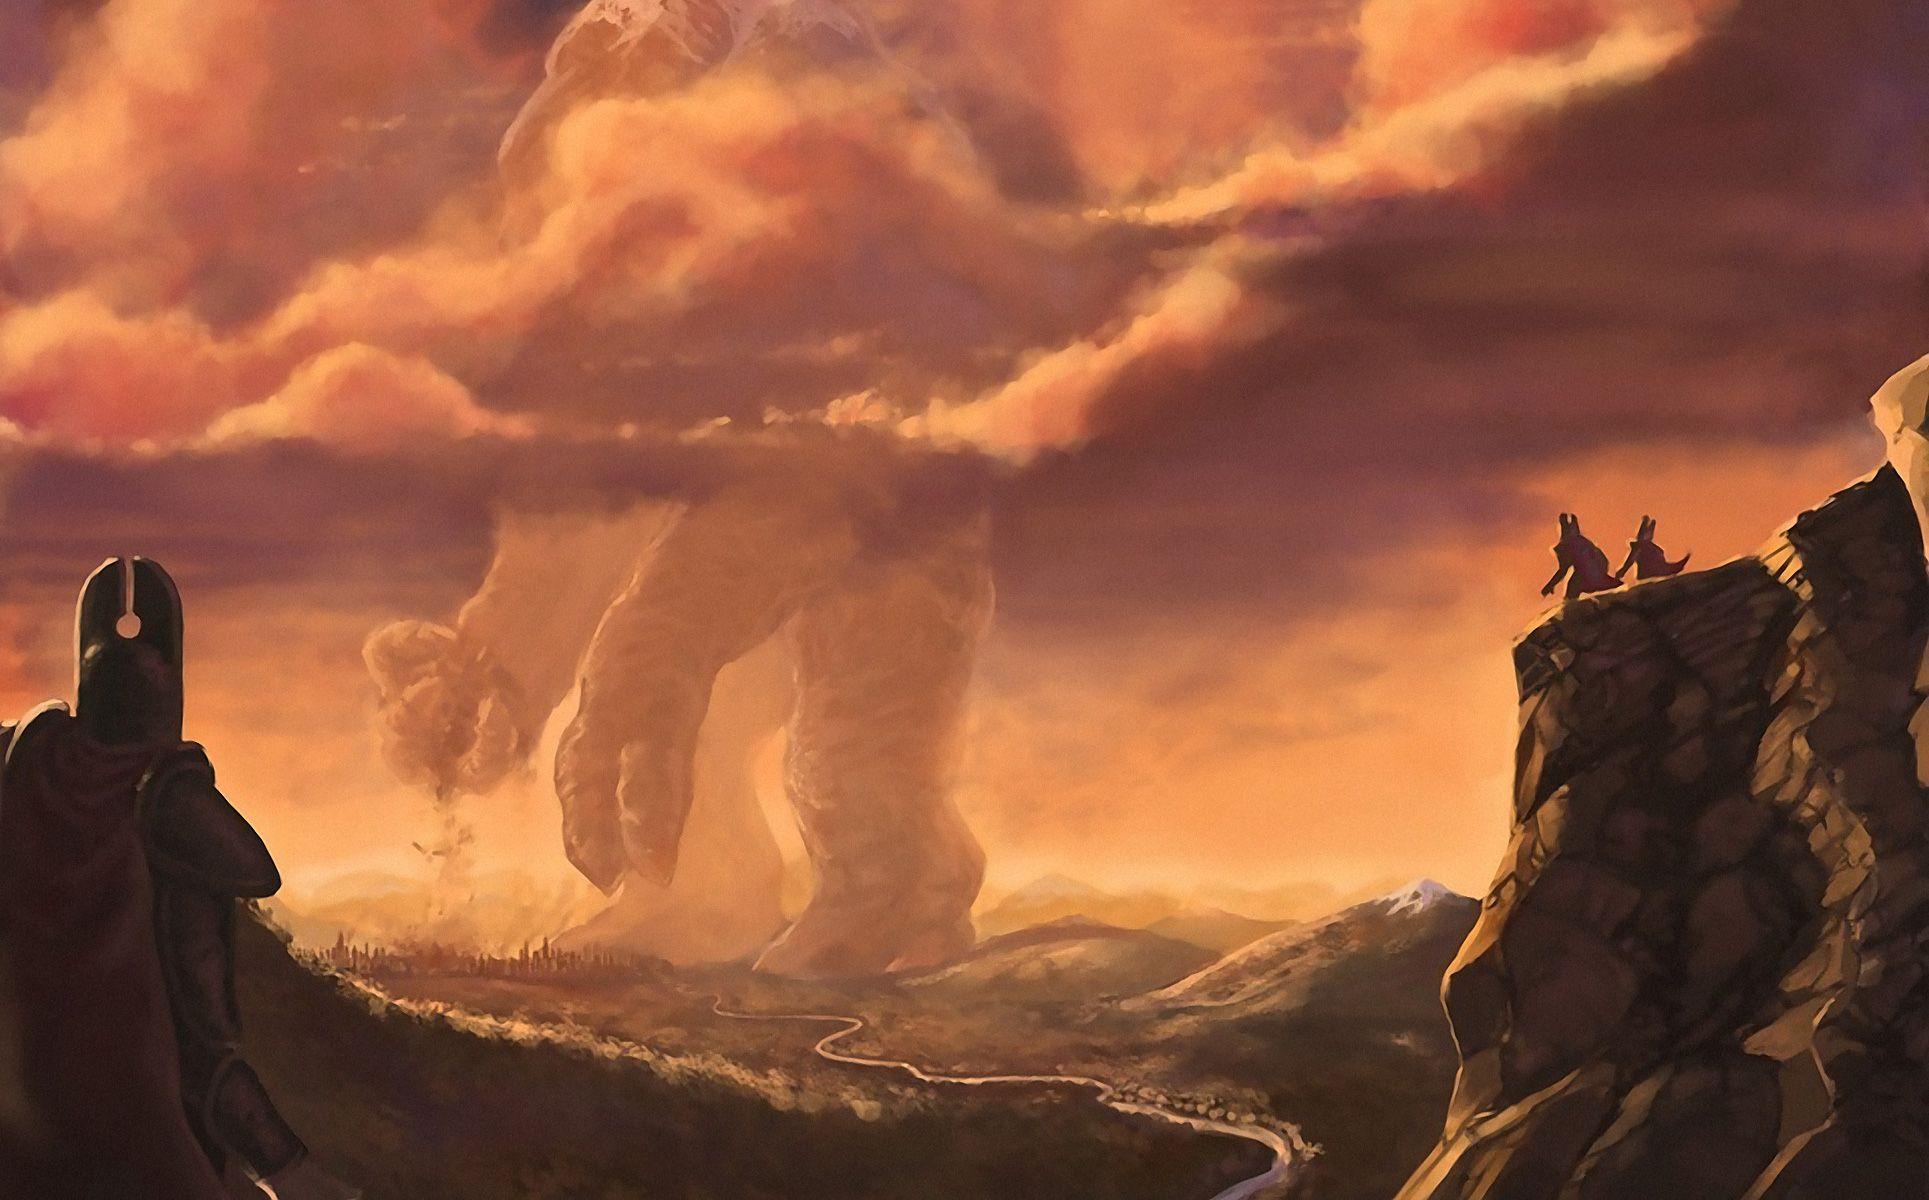 Giant Monster Wallpapers High Resolution In 2019 Monster